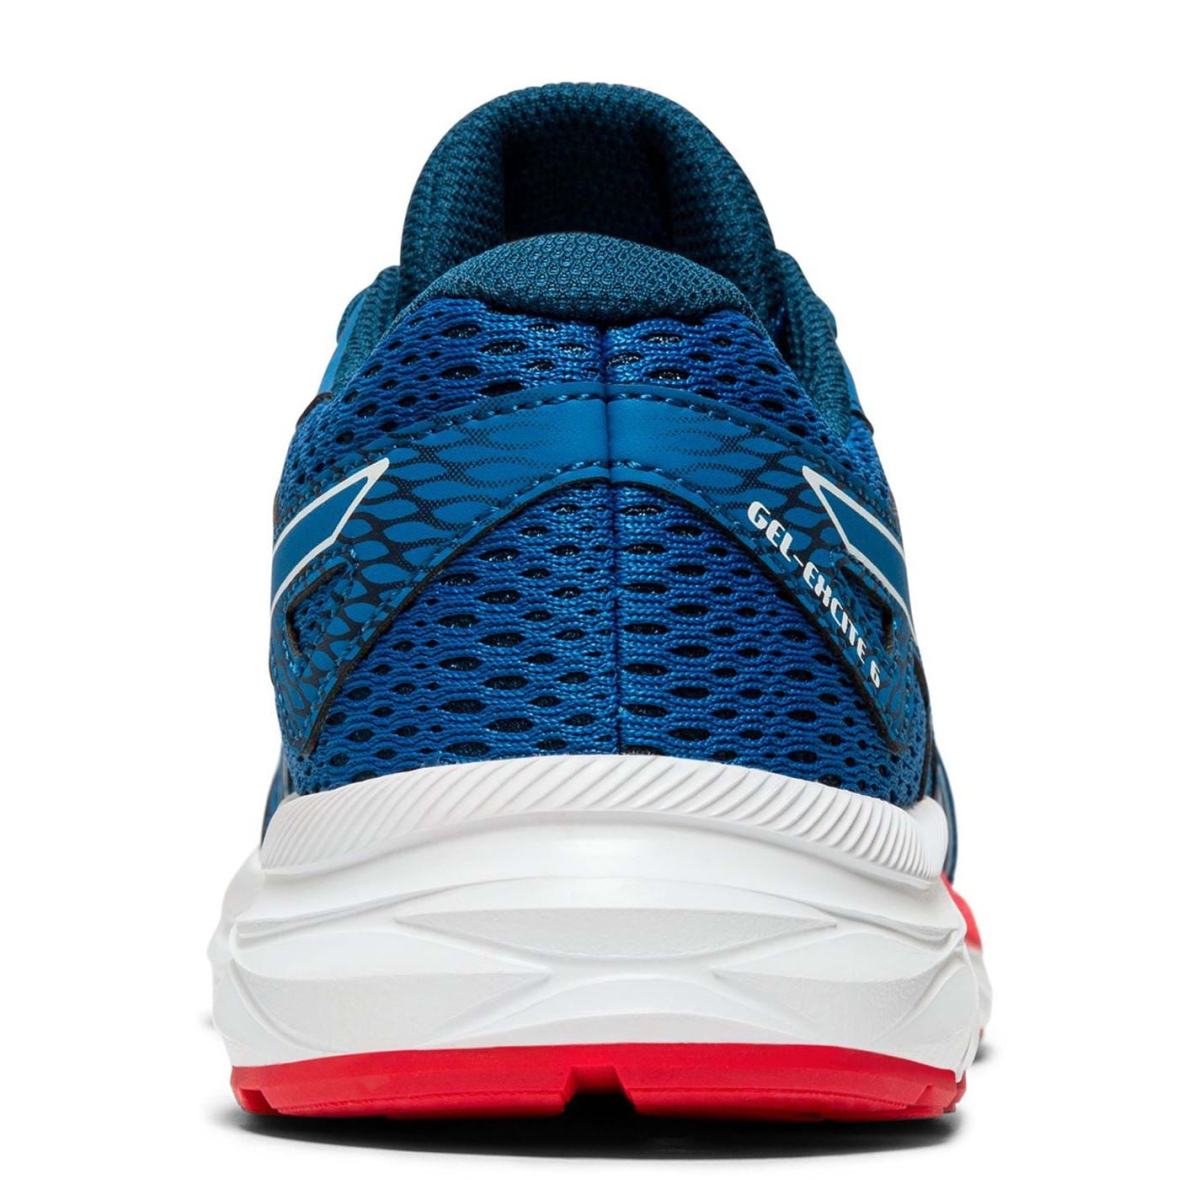 Asics-Gel-Excite-6-Turnschuhe-Laufschuhe-Jungen-Kinder-Sneaker-Sportschuhe-7026 Indexbild 8